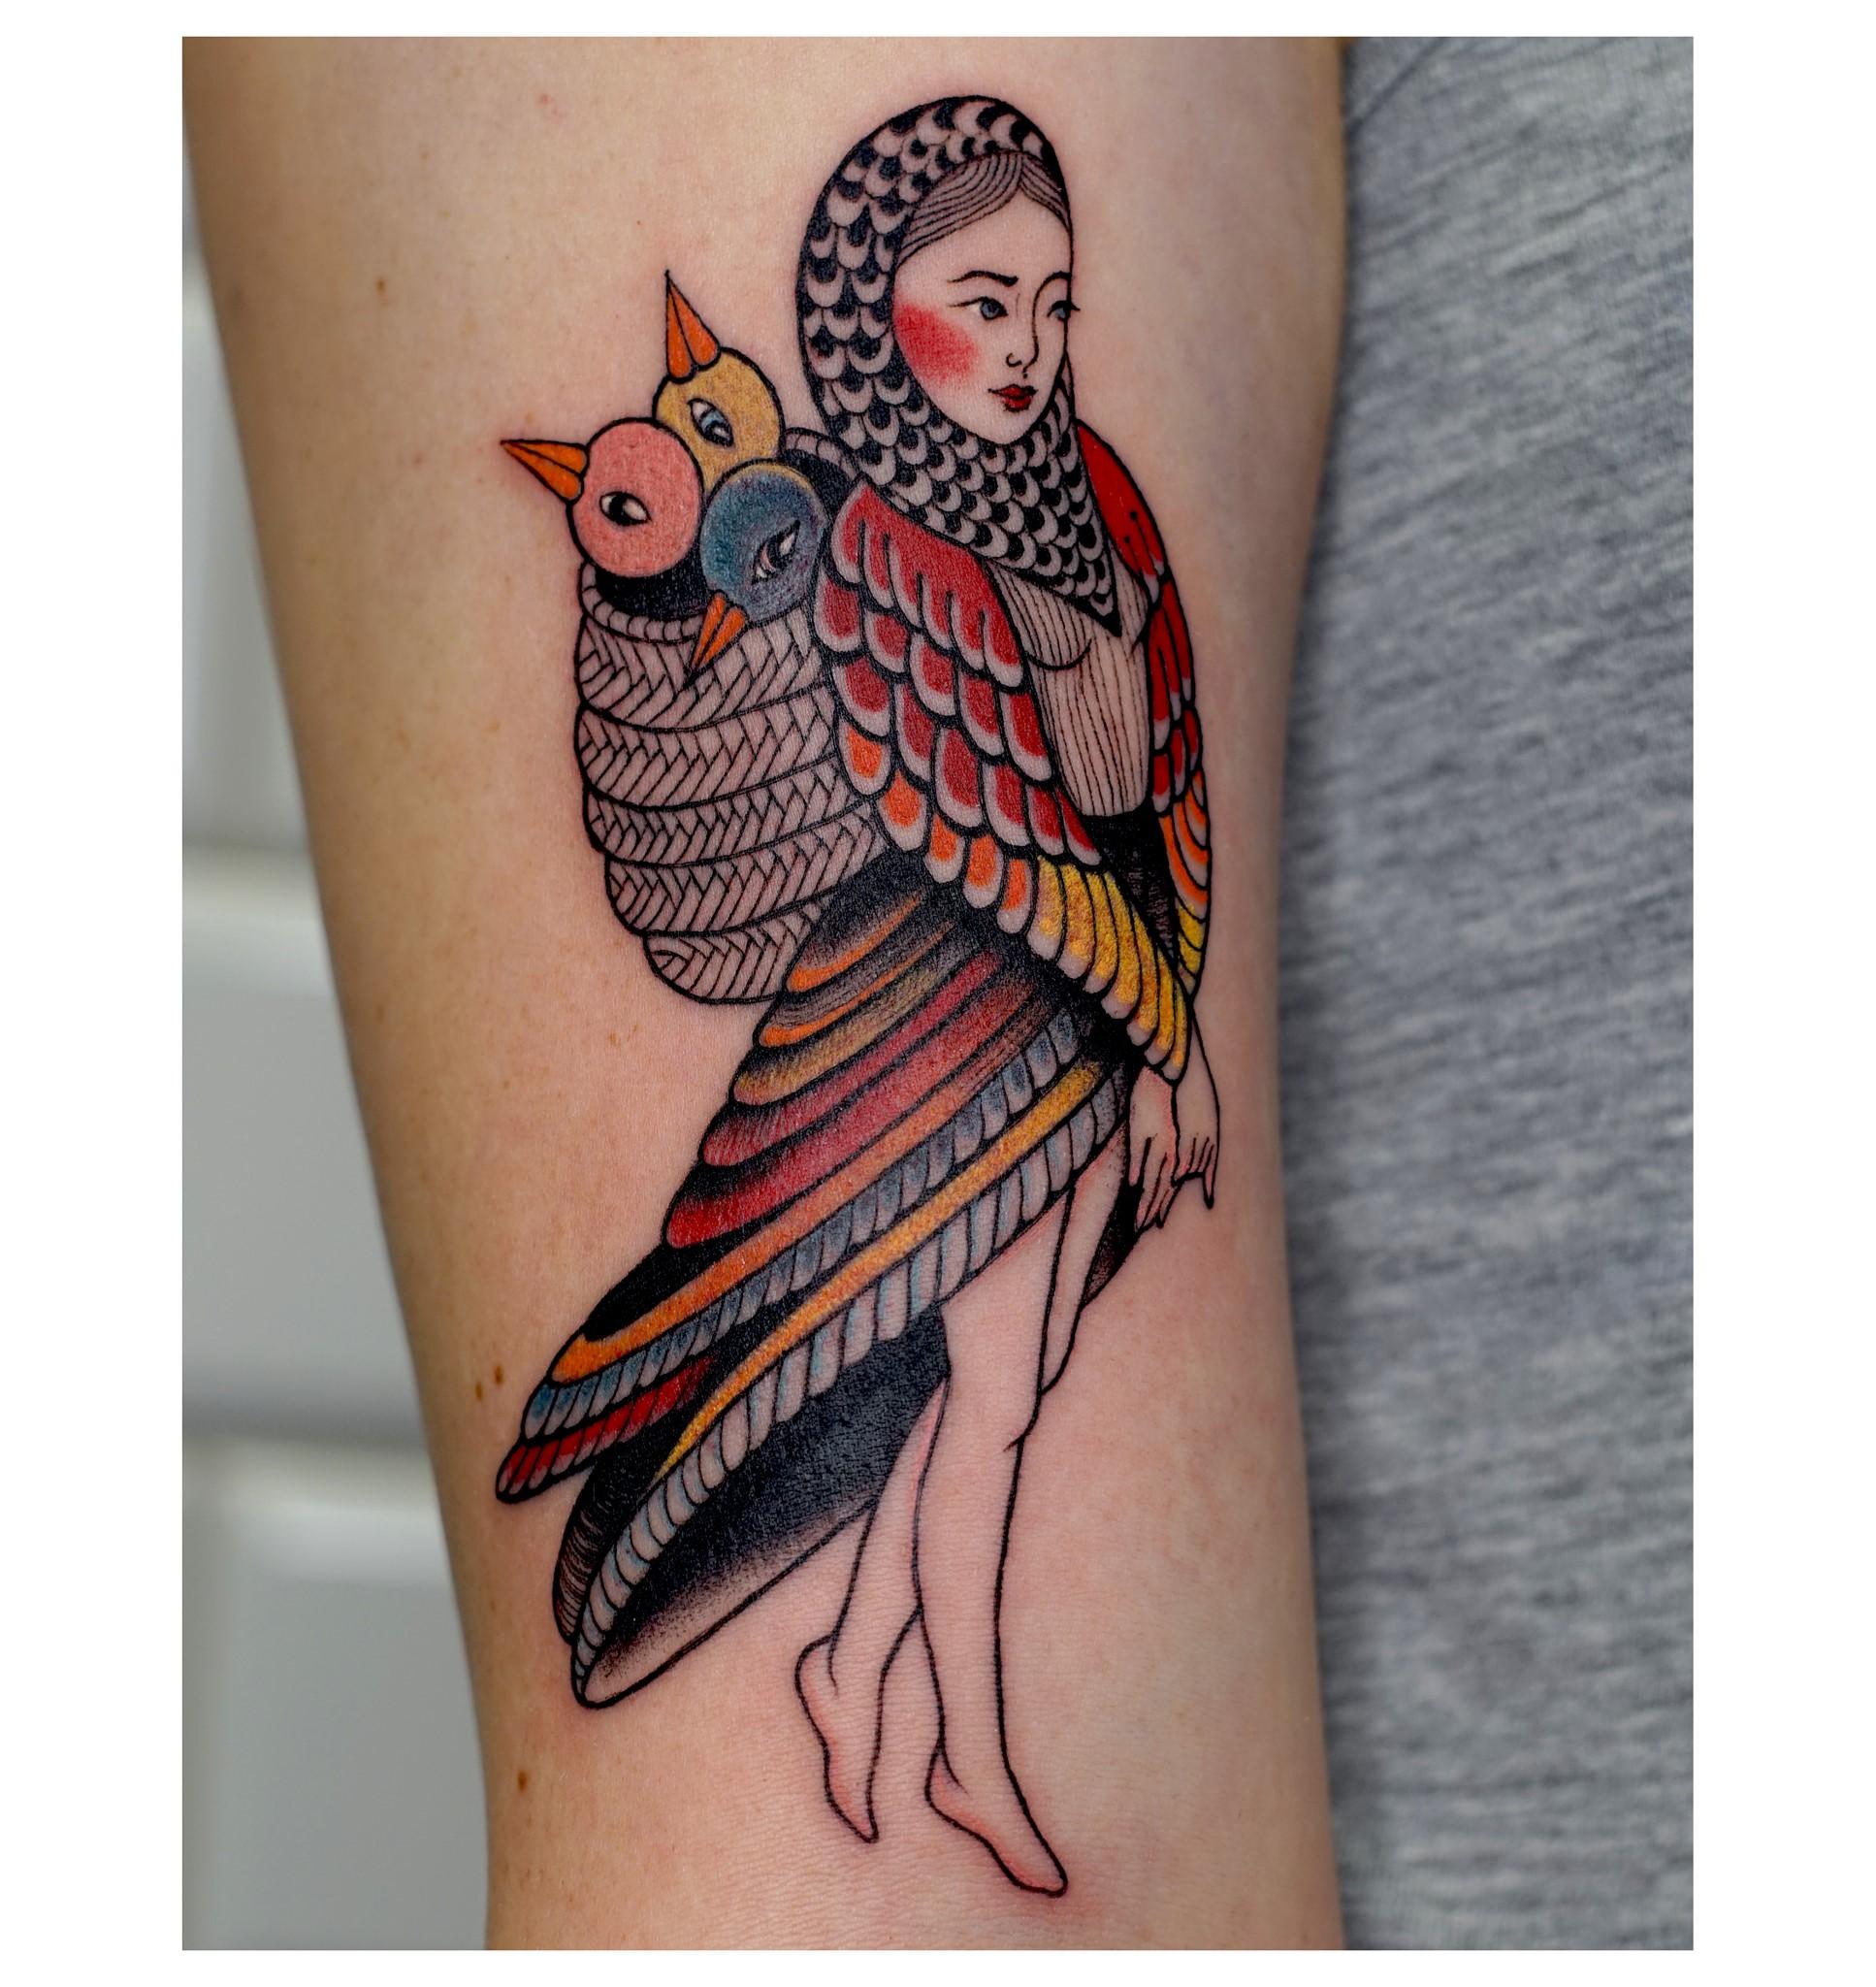 Anna Szejdewik aka Coxie inksearch tattoo